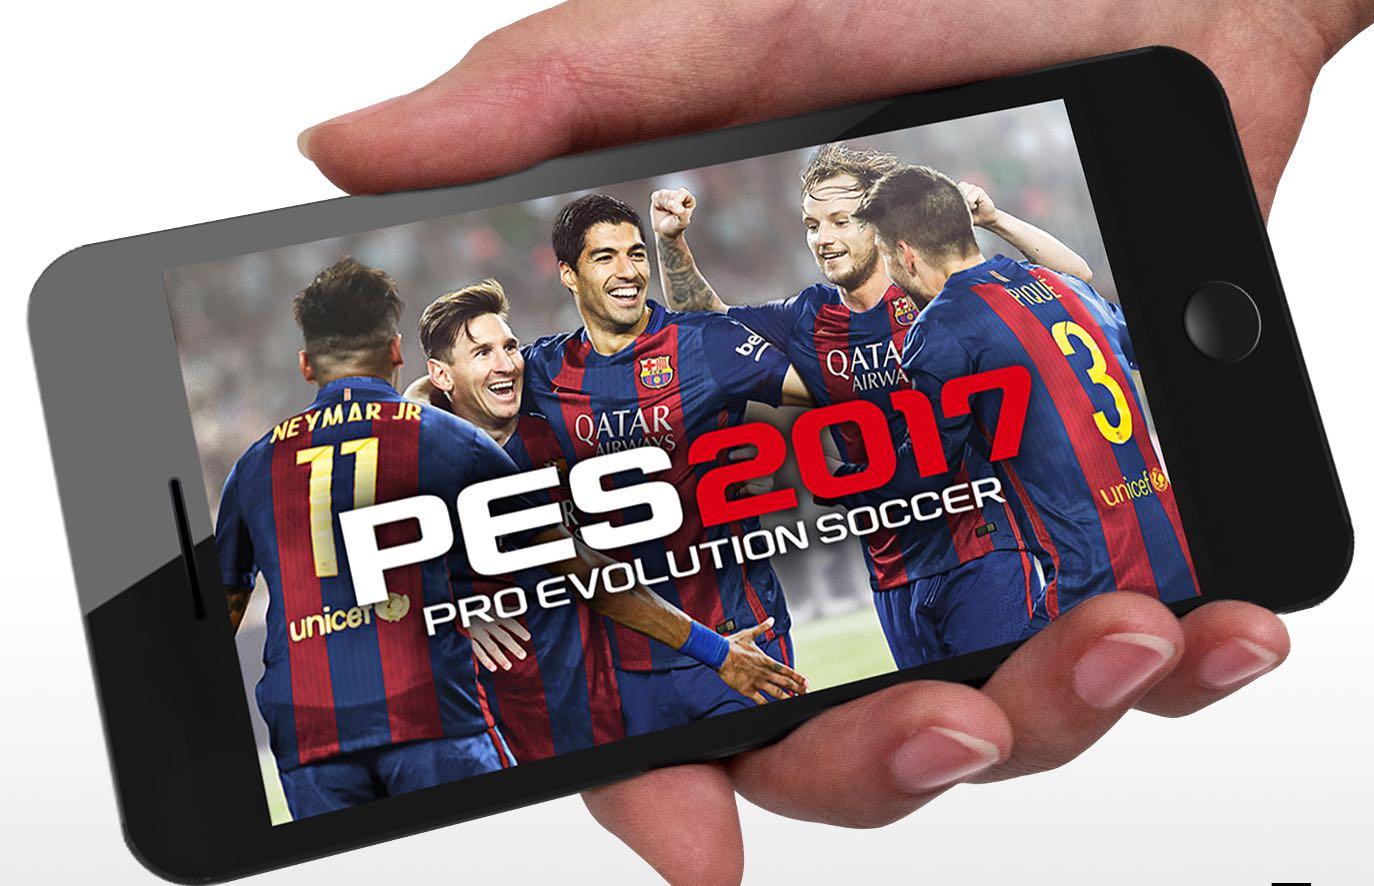 At long last, Konami's Pro Evolution Soccer 2017 hits App Store